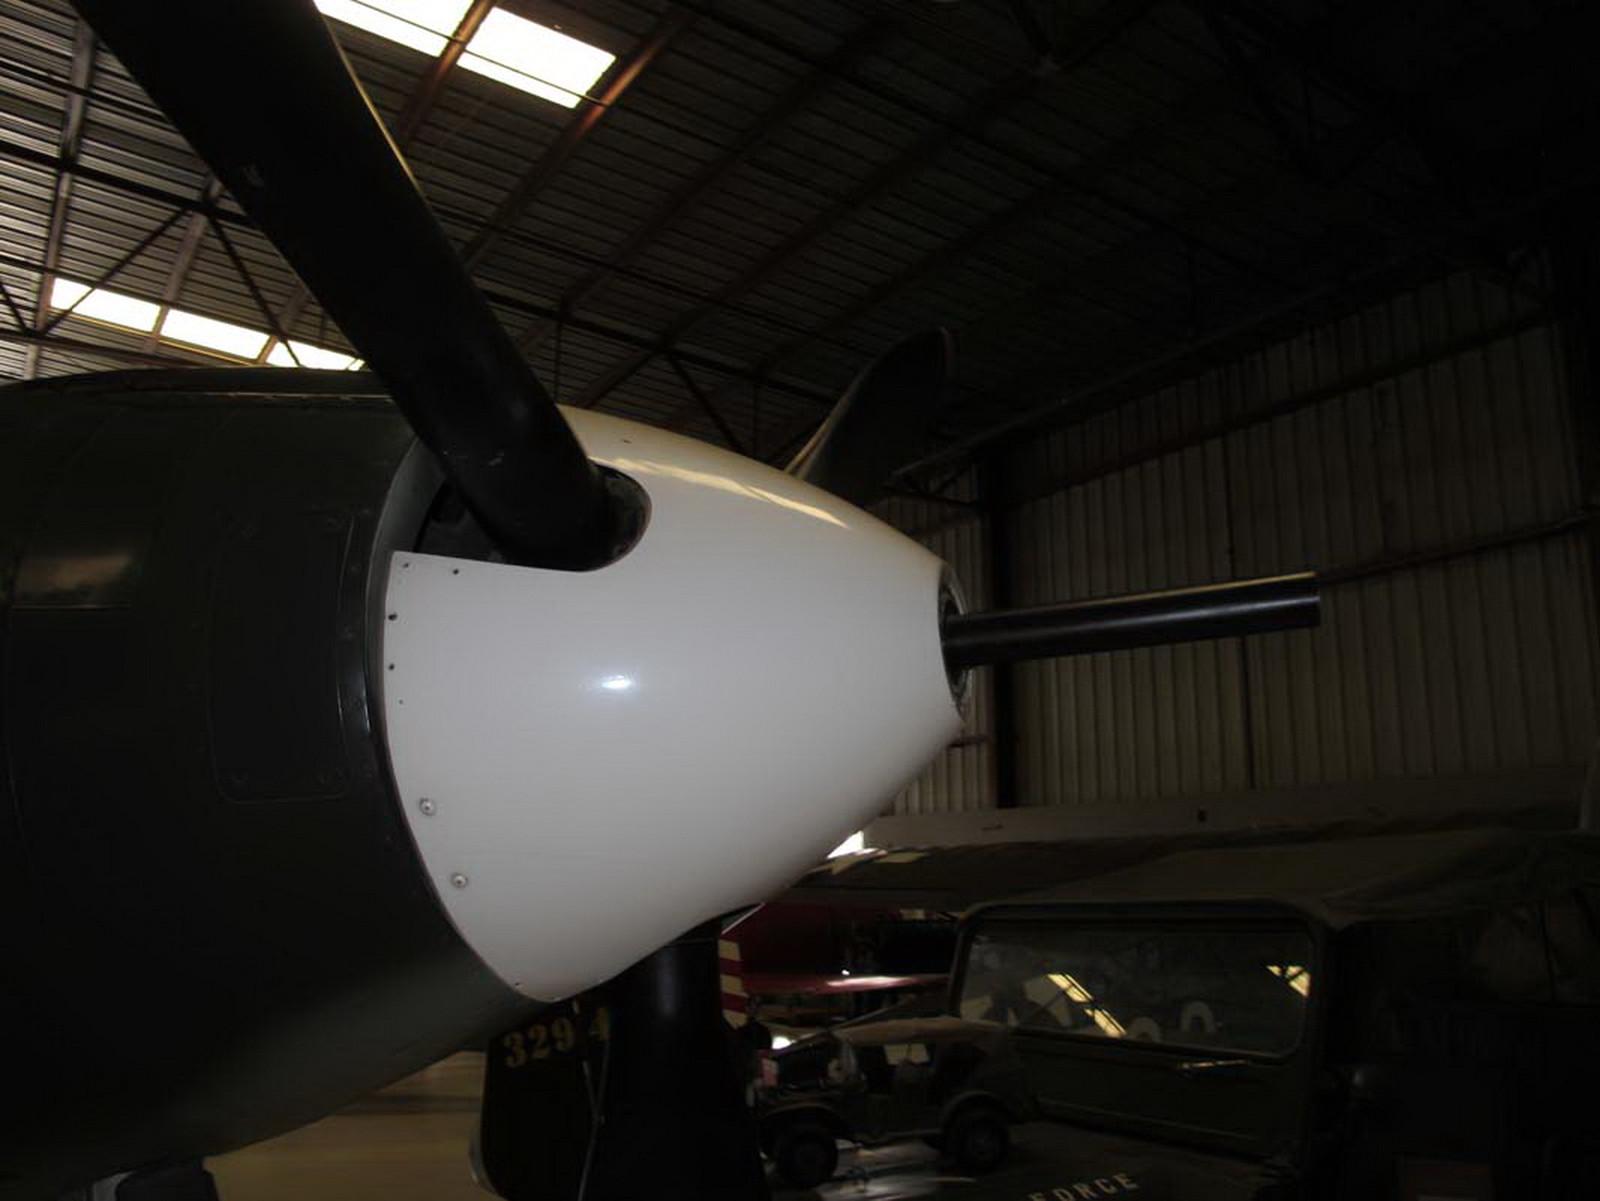 Bell P-39N Airacobra (3)